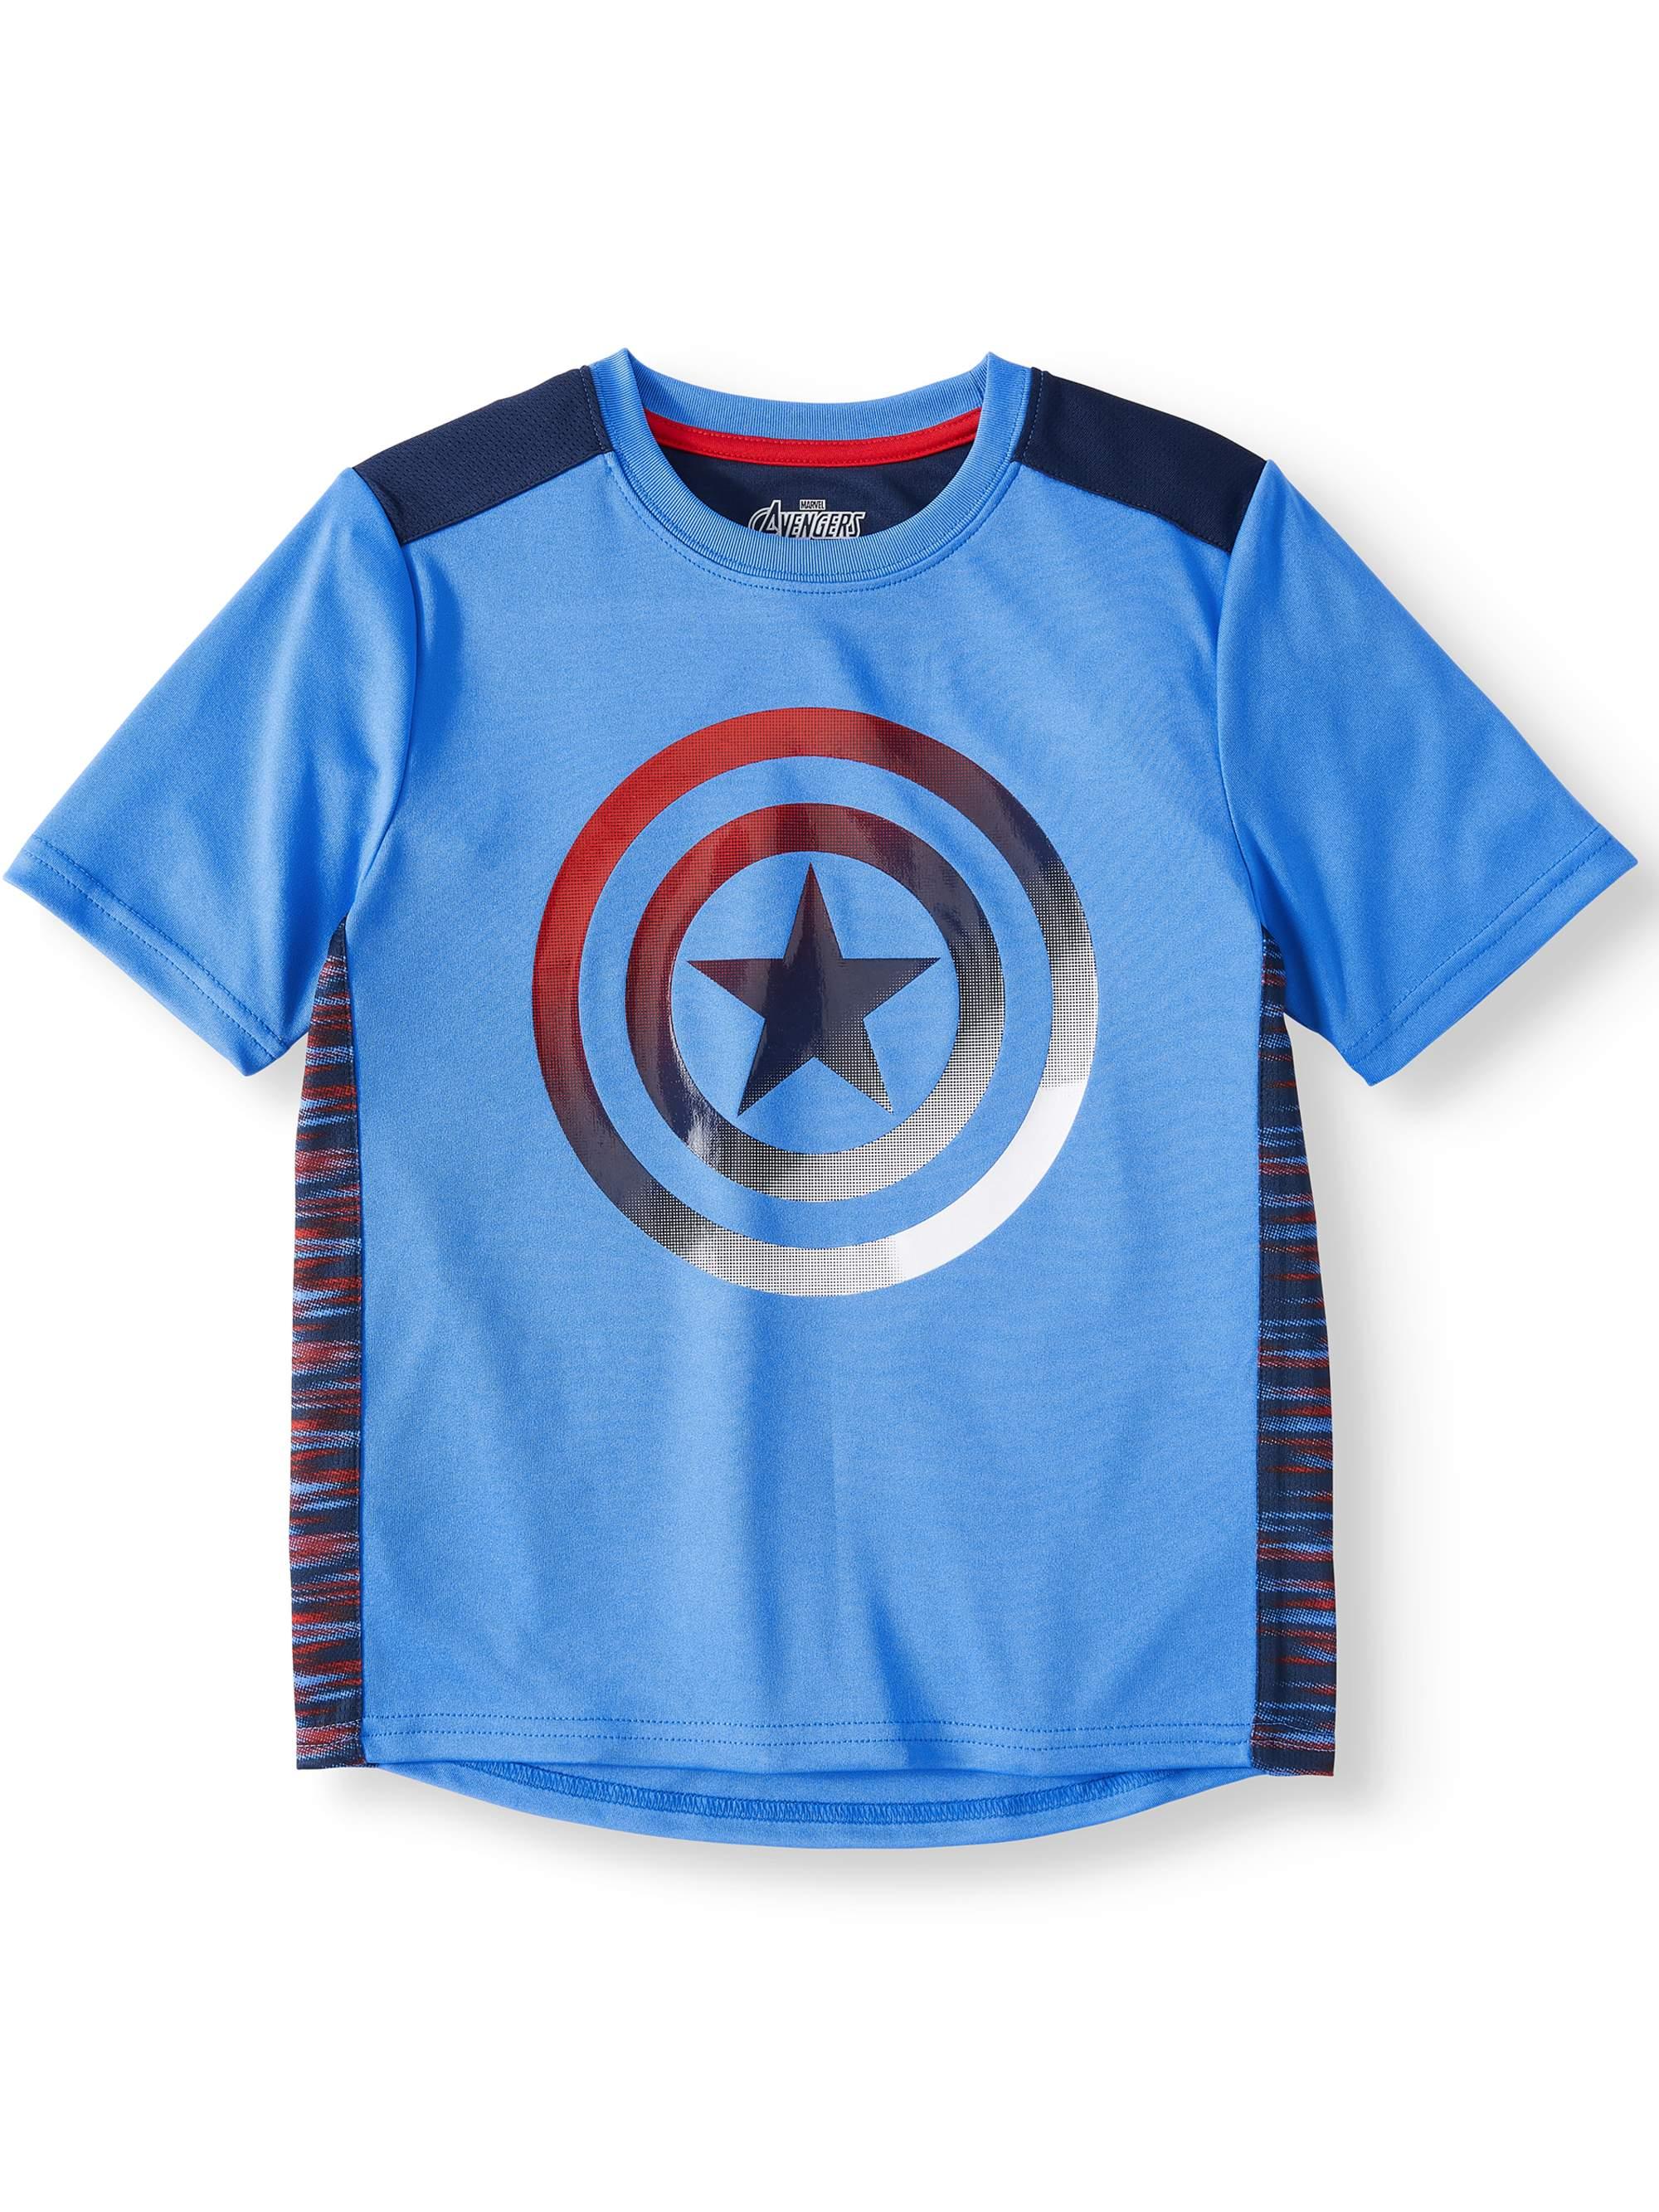 Captain America Short Sleeve Performance Tee Shirt (Little Boys & Big Boys)